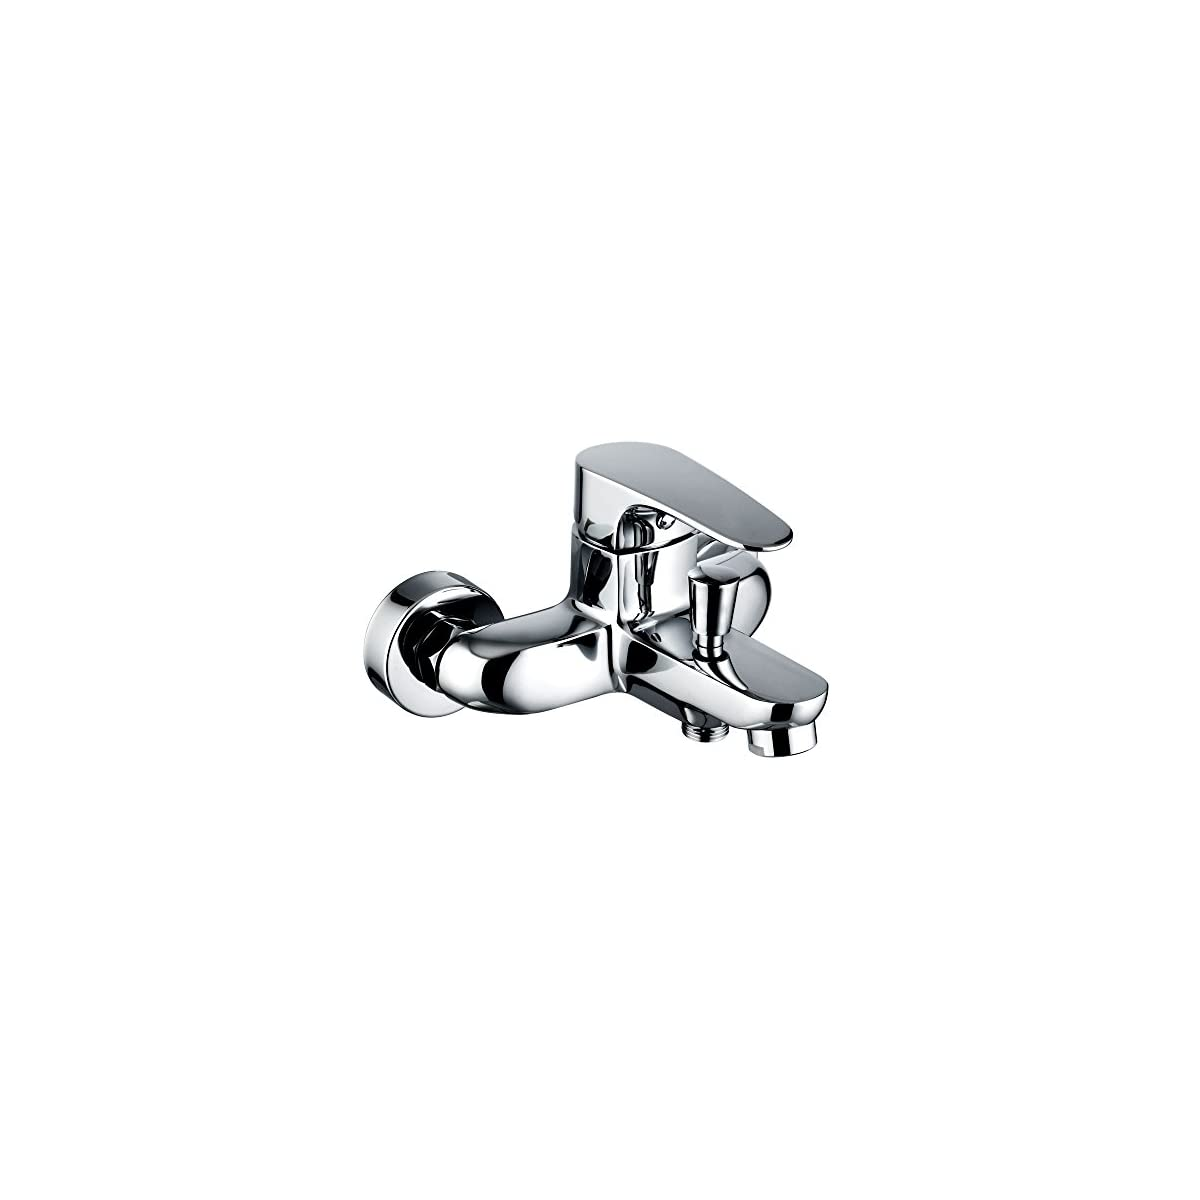 41QOby8ZETL. SS1200  - Clever 98167 Grifo de baño/Ducha